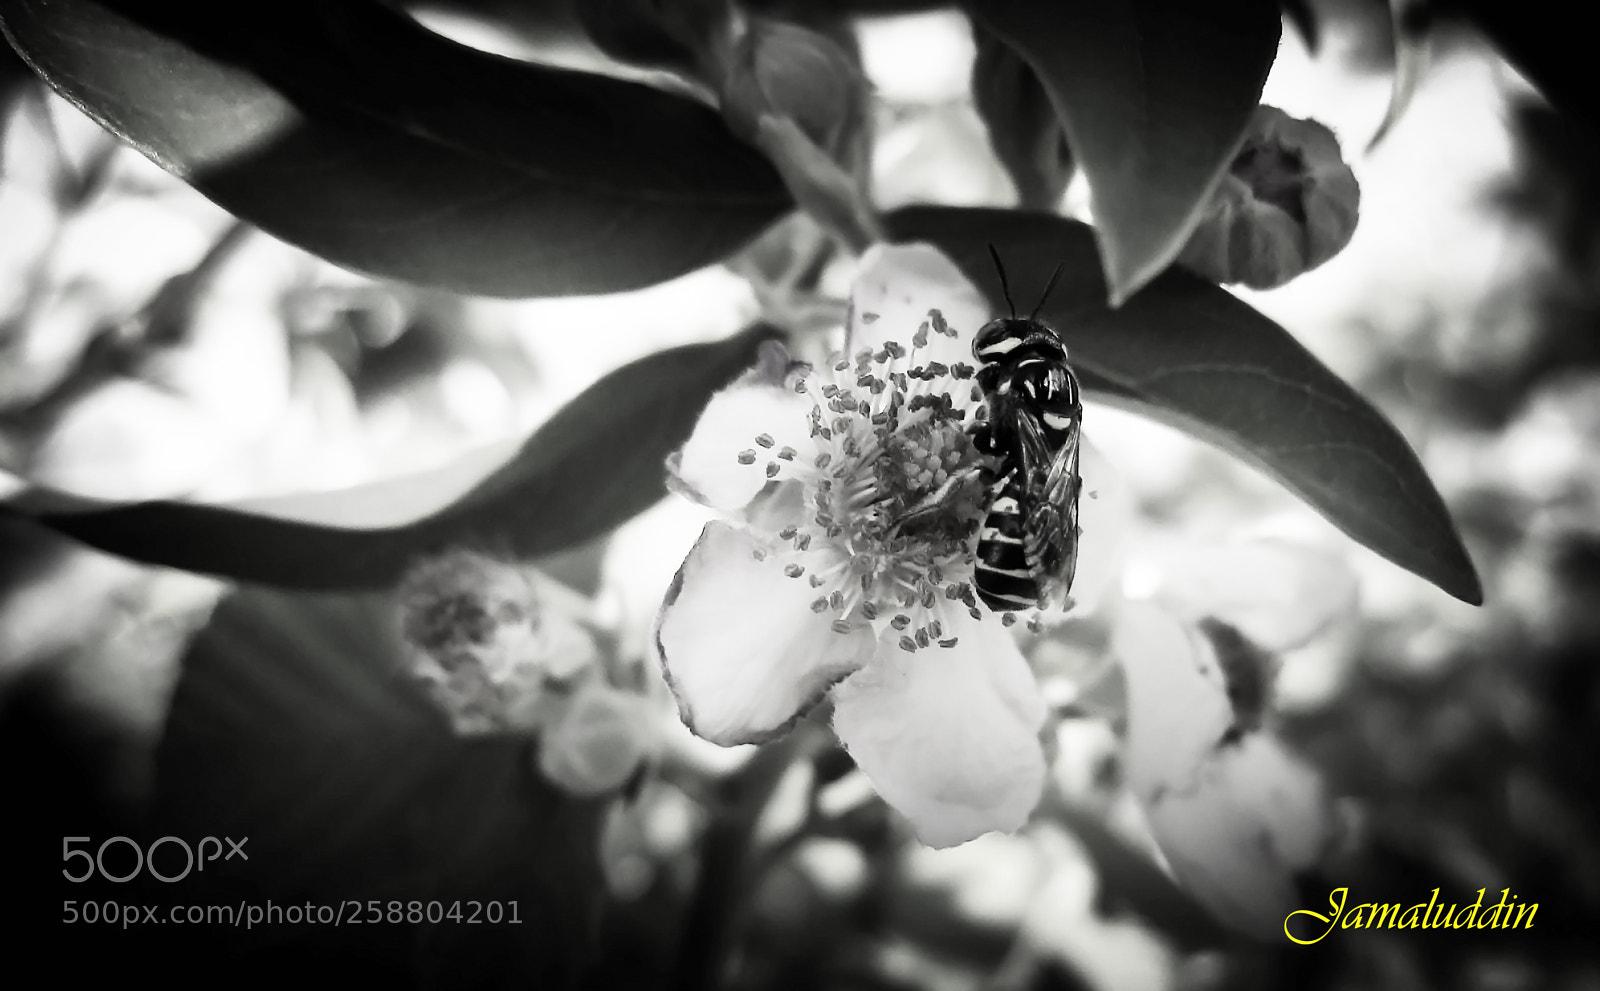 Bee and Flower, Canon DIGITAL IXUS 870 IS